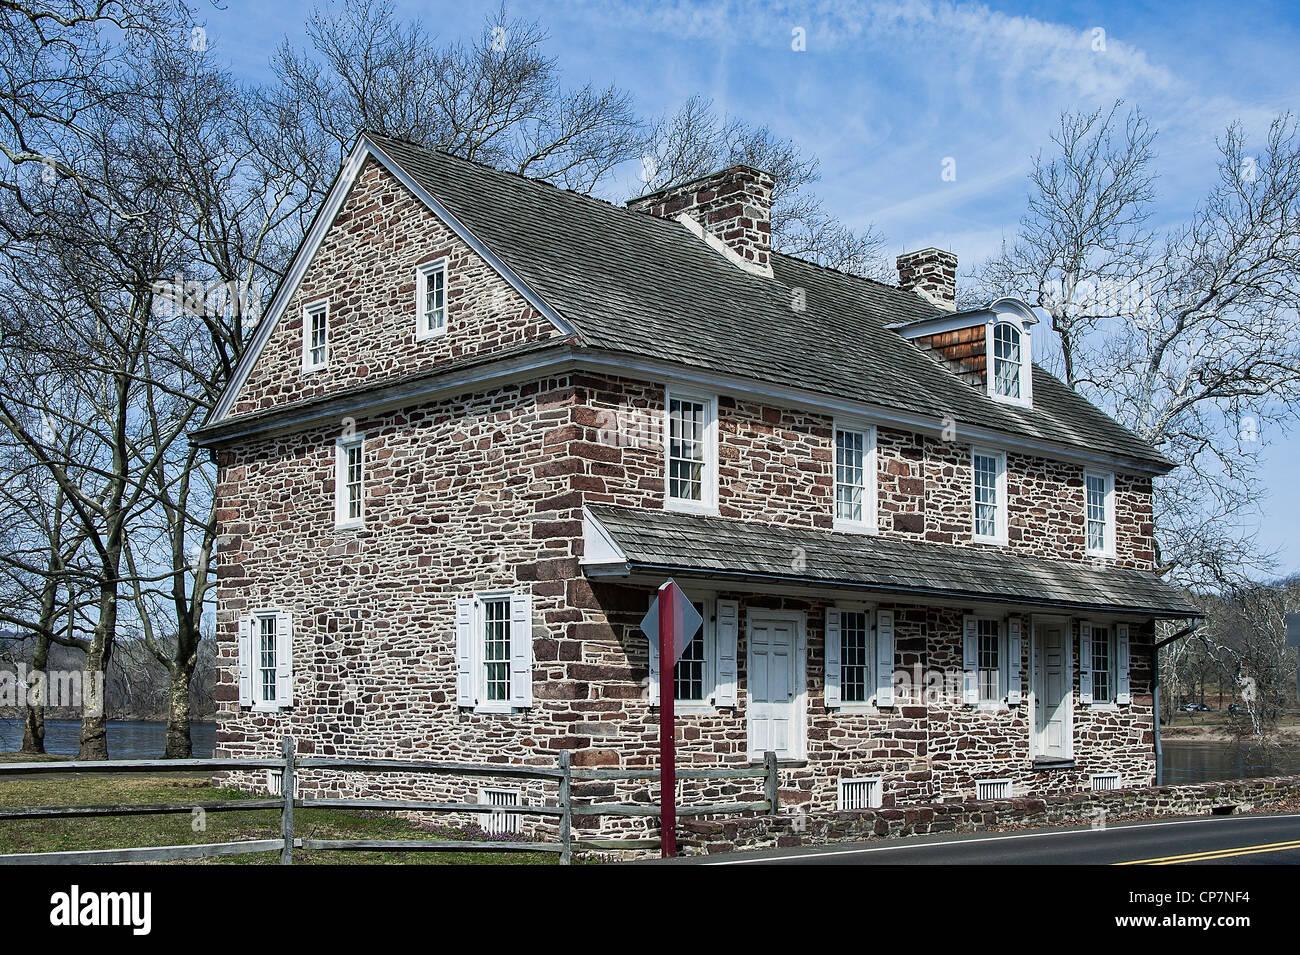 McConkey's Ferry Inn, Washington Crossing Park, PA, Pennsylvania, USA - Stock Image